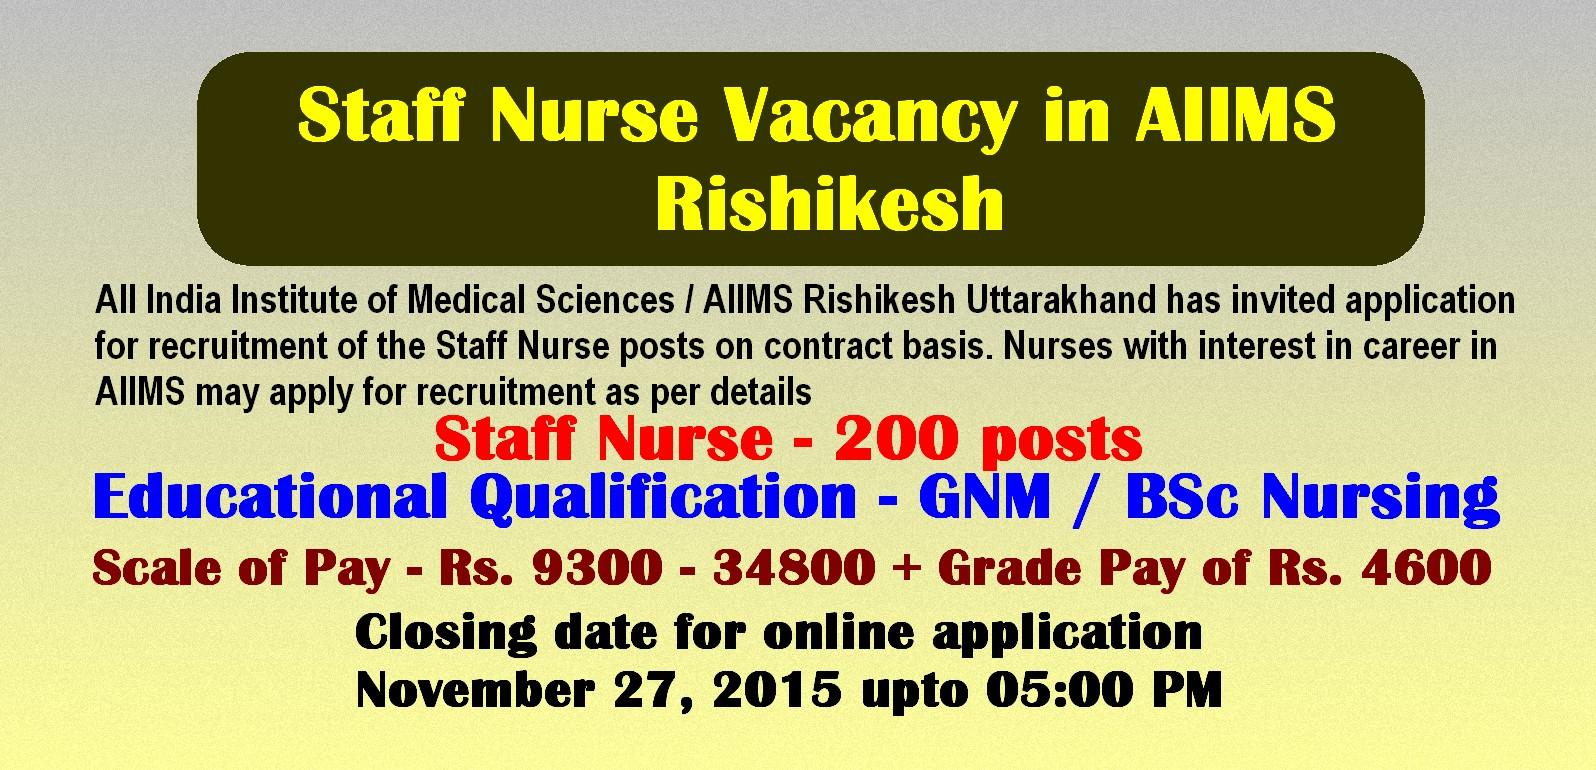 job application for staff nurse